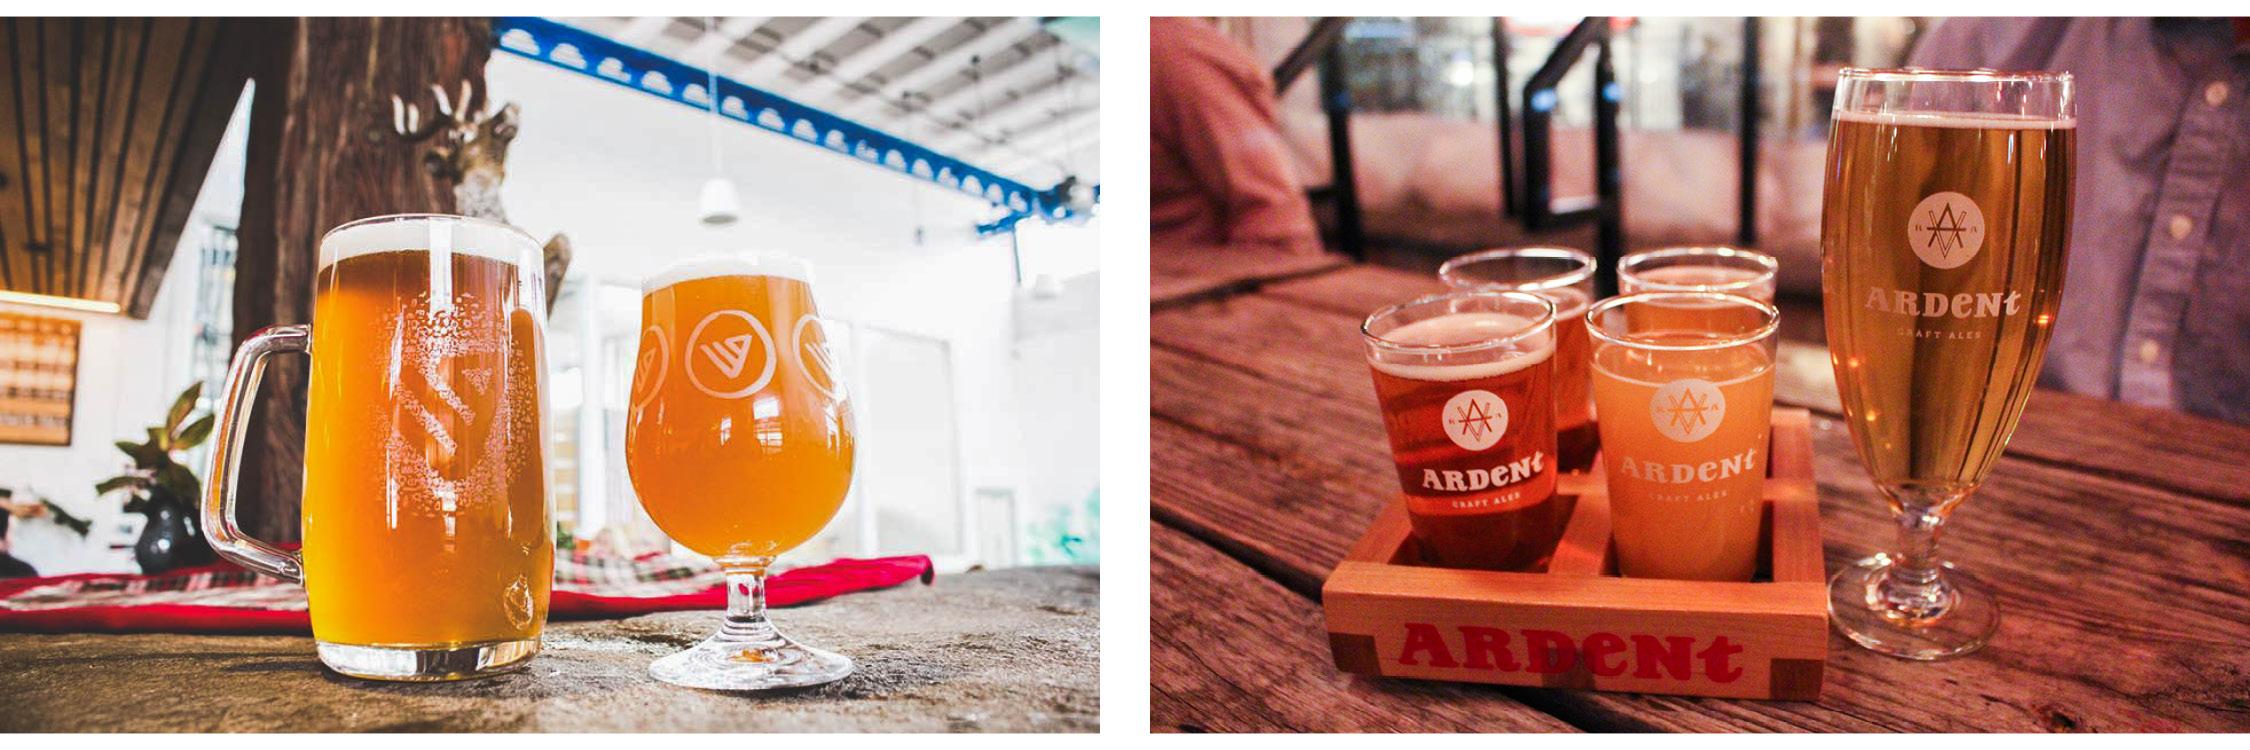 Images: Vasen Brewing / Ardent Craft Ales